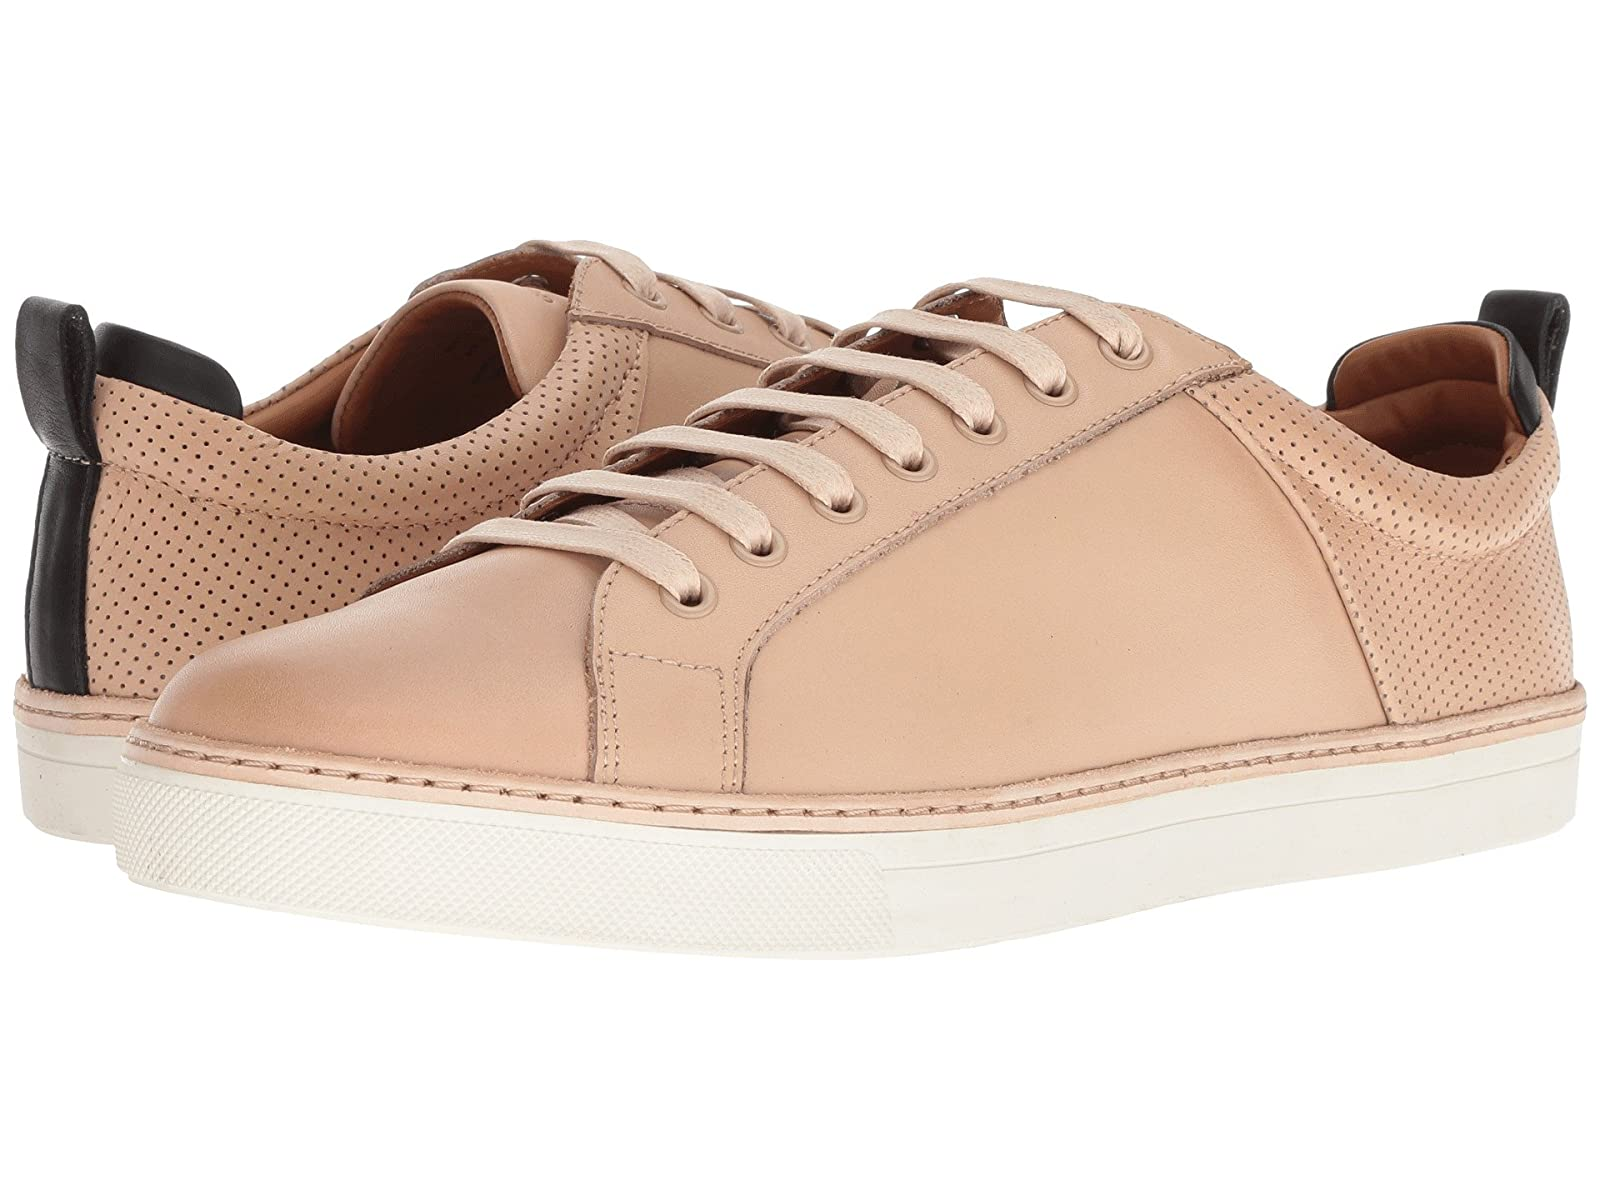 Gordon Rush MarstonAtmospheric grades have affordable shoes